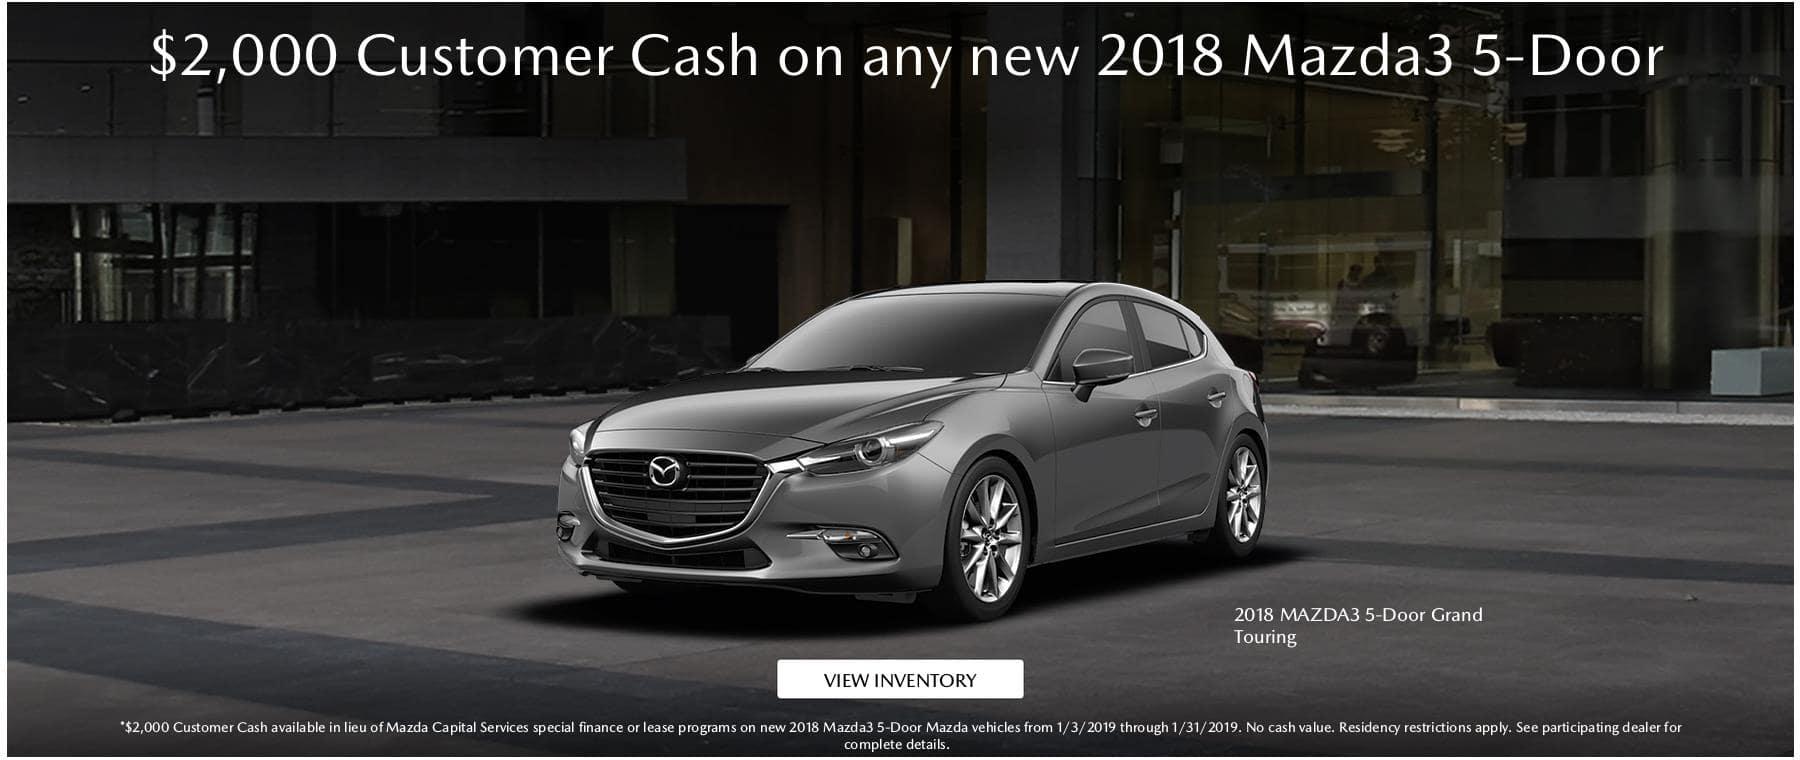 MY18 Mazda3 5dr 2000 CC_1800x760